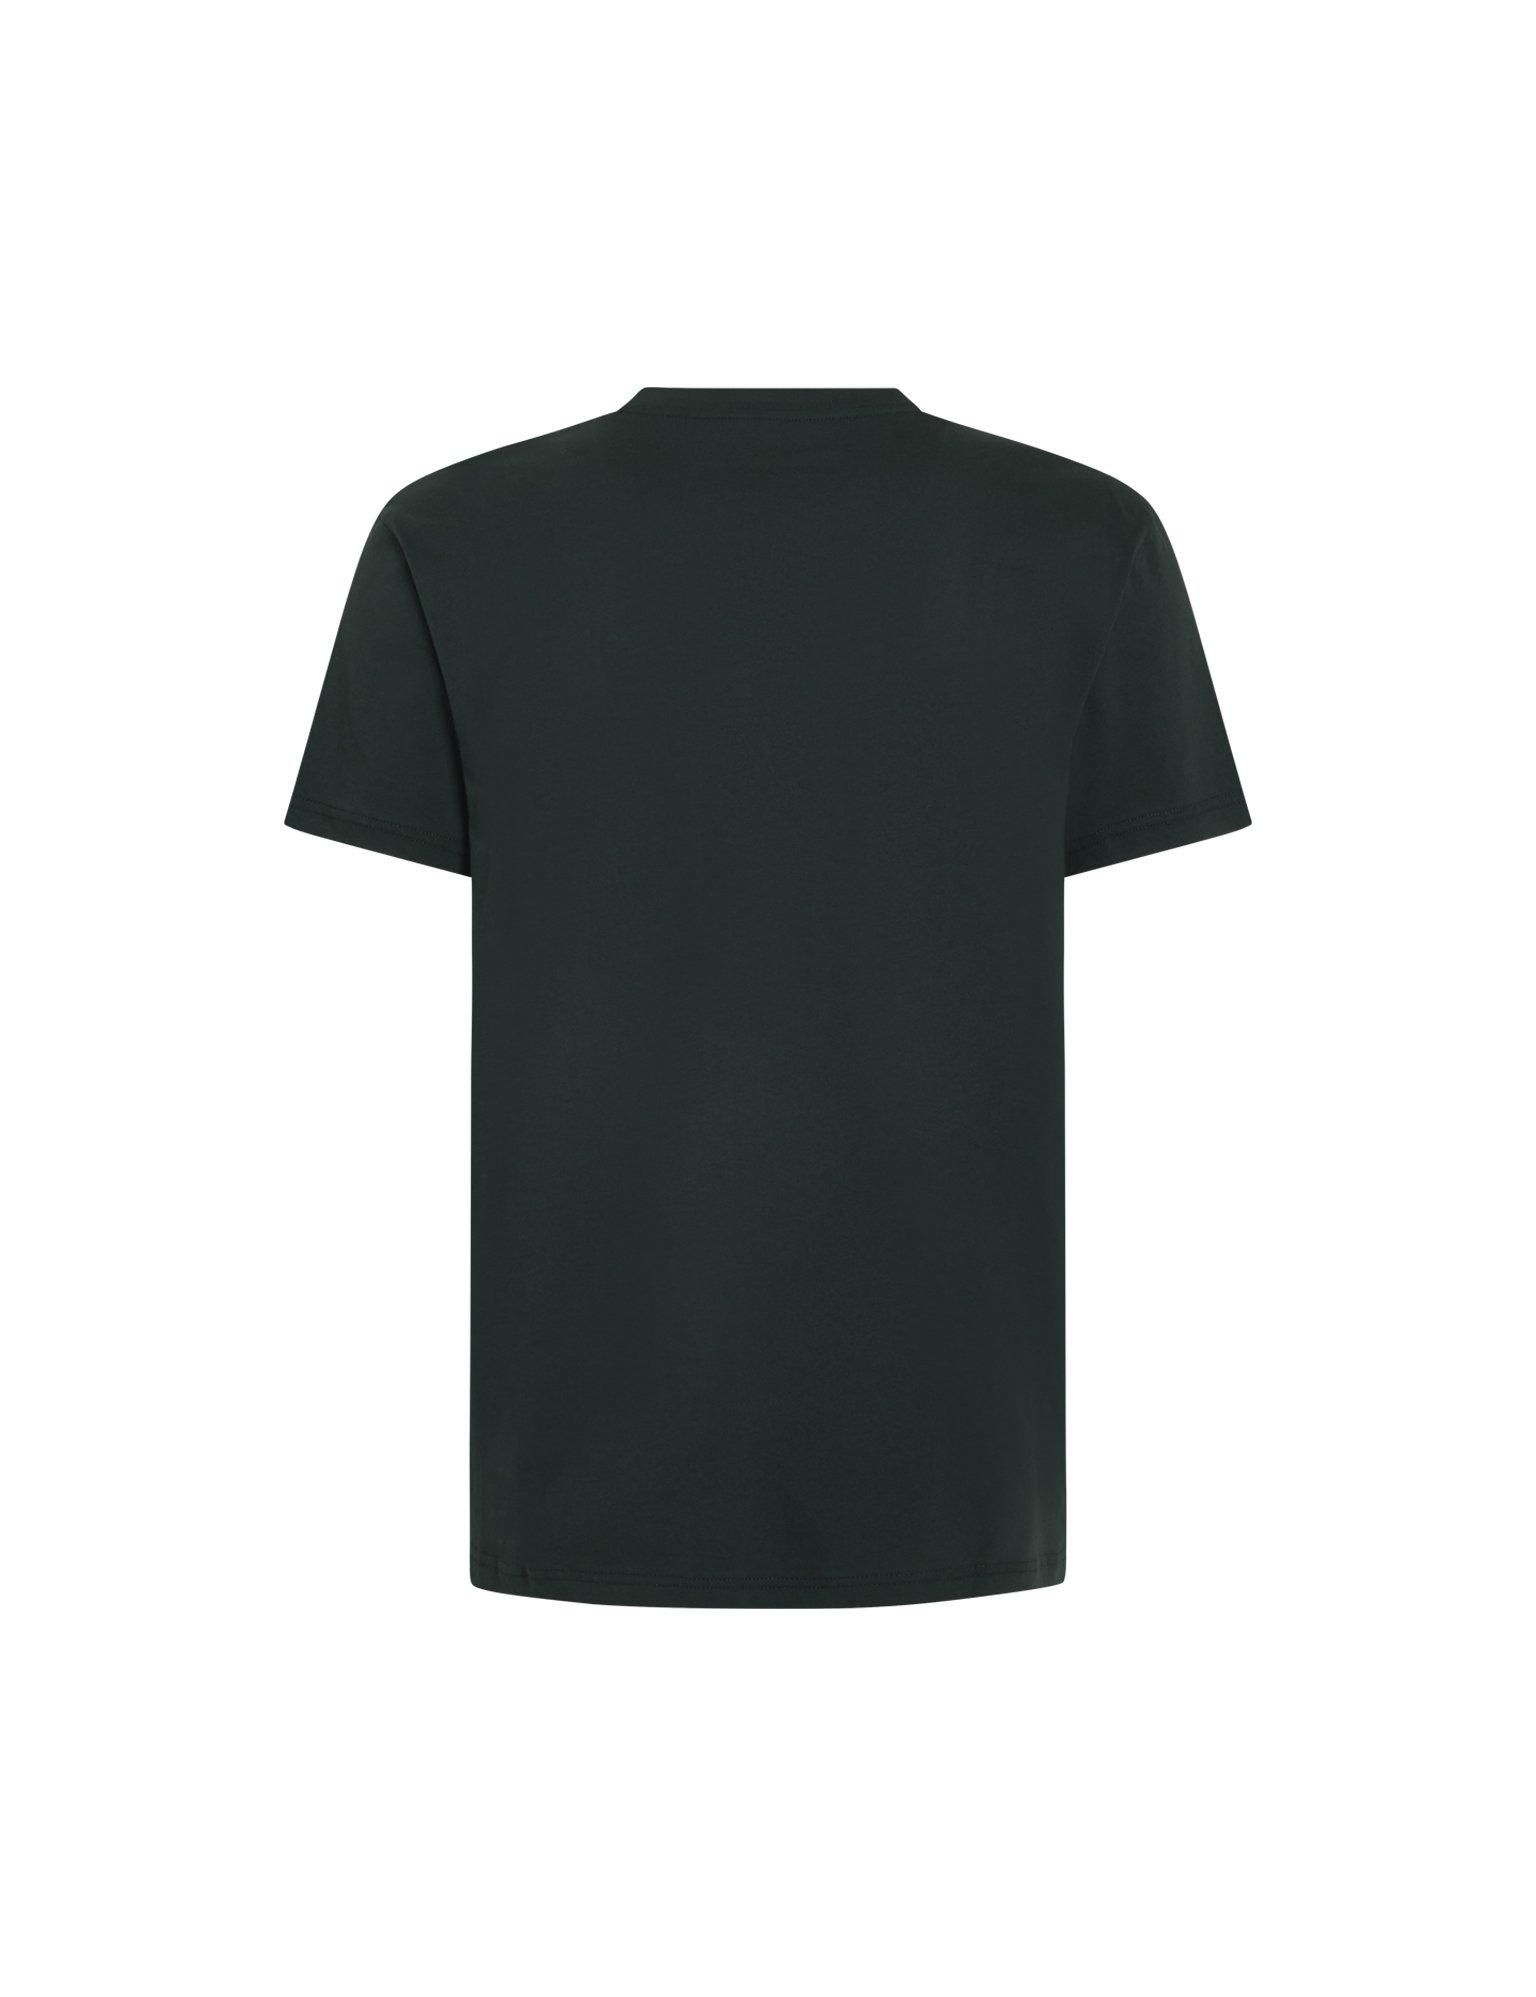 Mads Nørgaard Favorite Thor t-shirt, scarab, medium